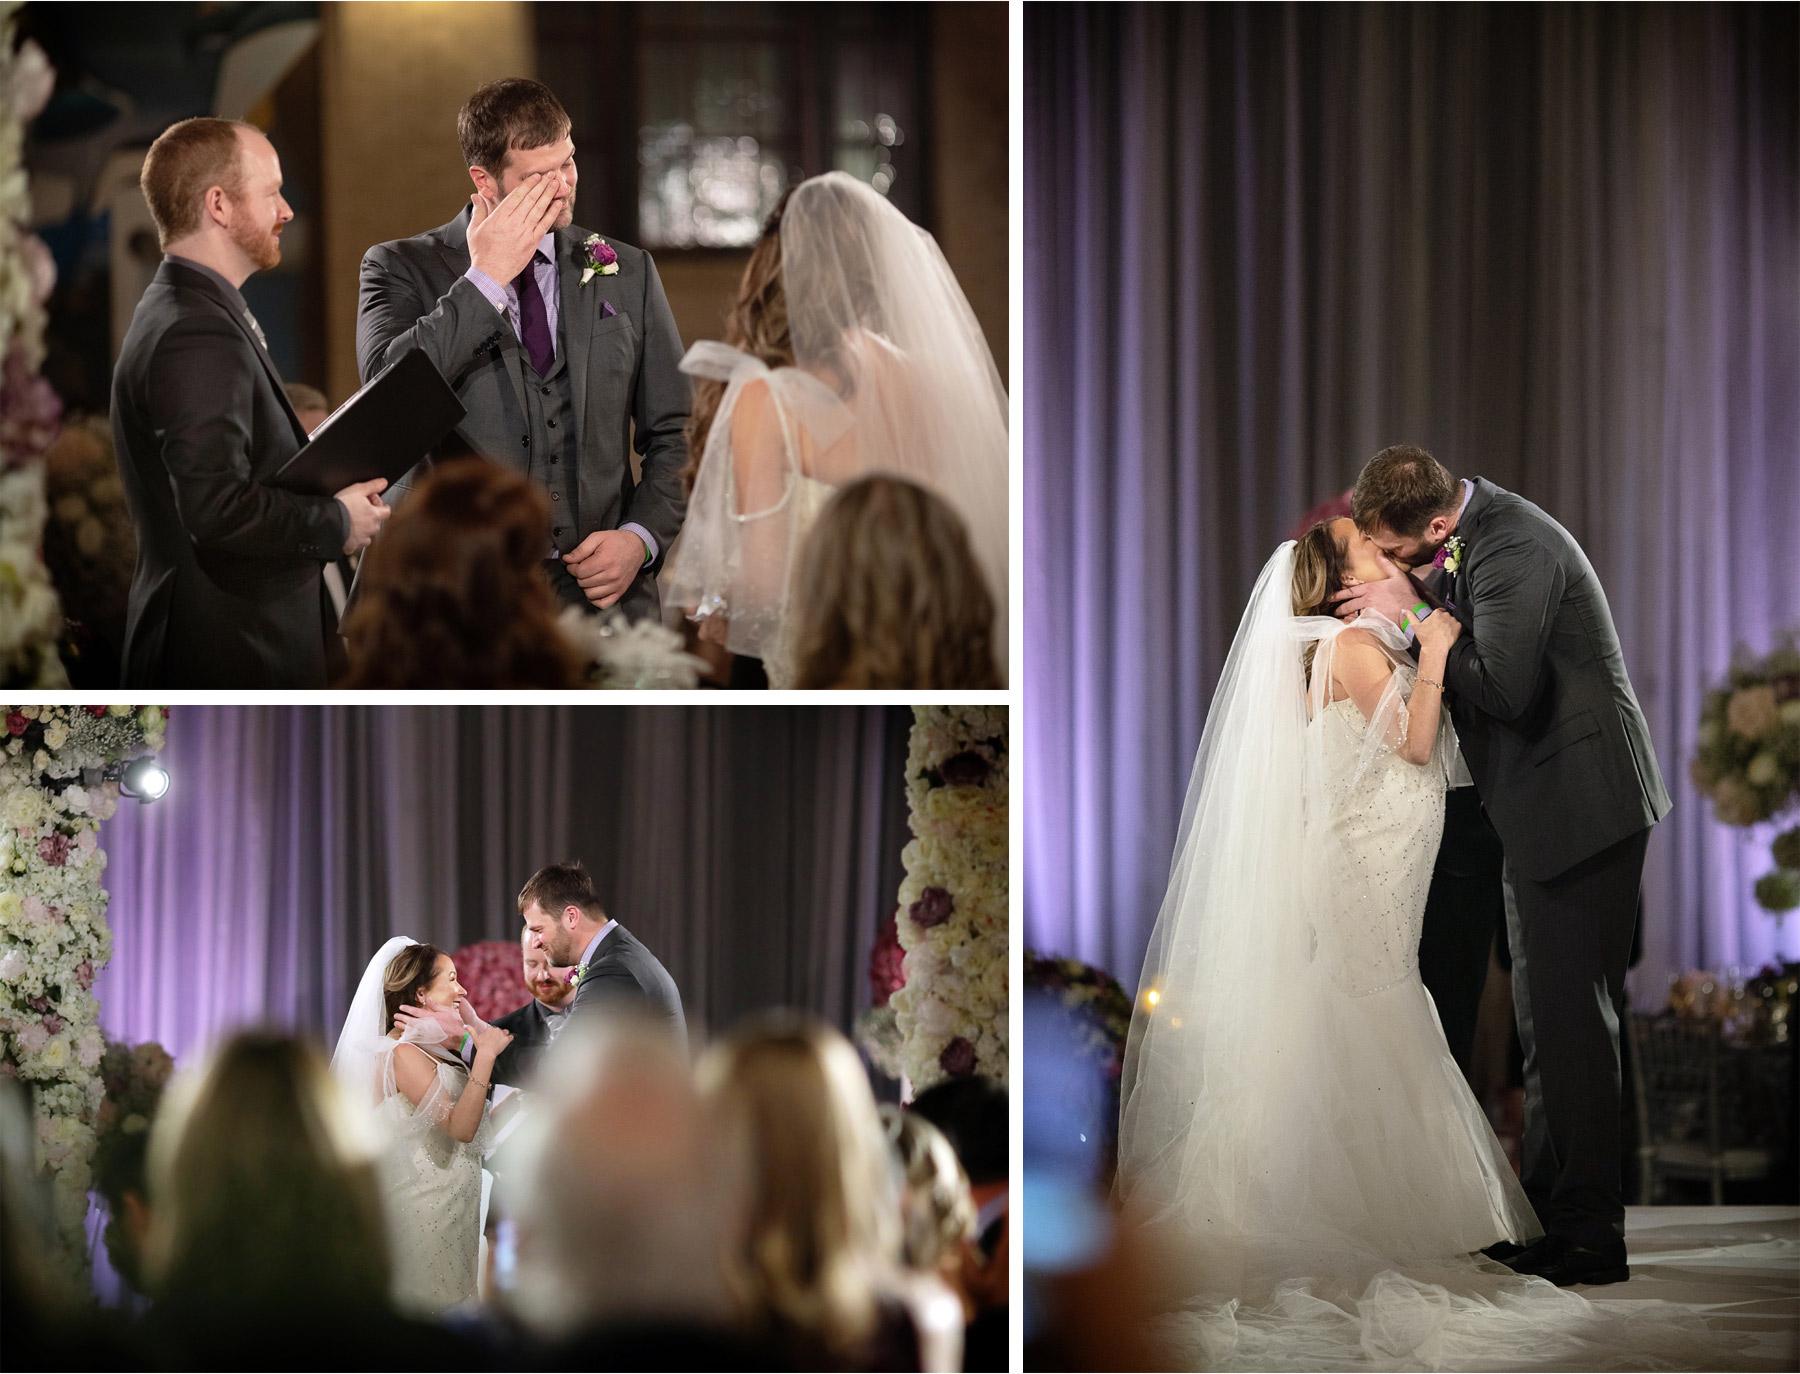 10-Saint-Paul-Minnesota-Wedding-by-Vick-Photography-Union-Depot-Lifetime-Network-David-Tutera-My-Great-Big-Live-Wedding-Ceremony-Jen-and-Rob.jpg